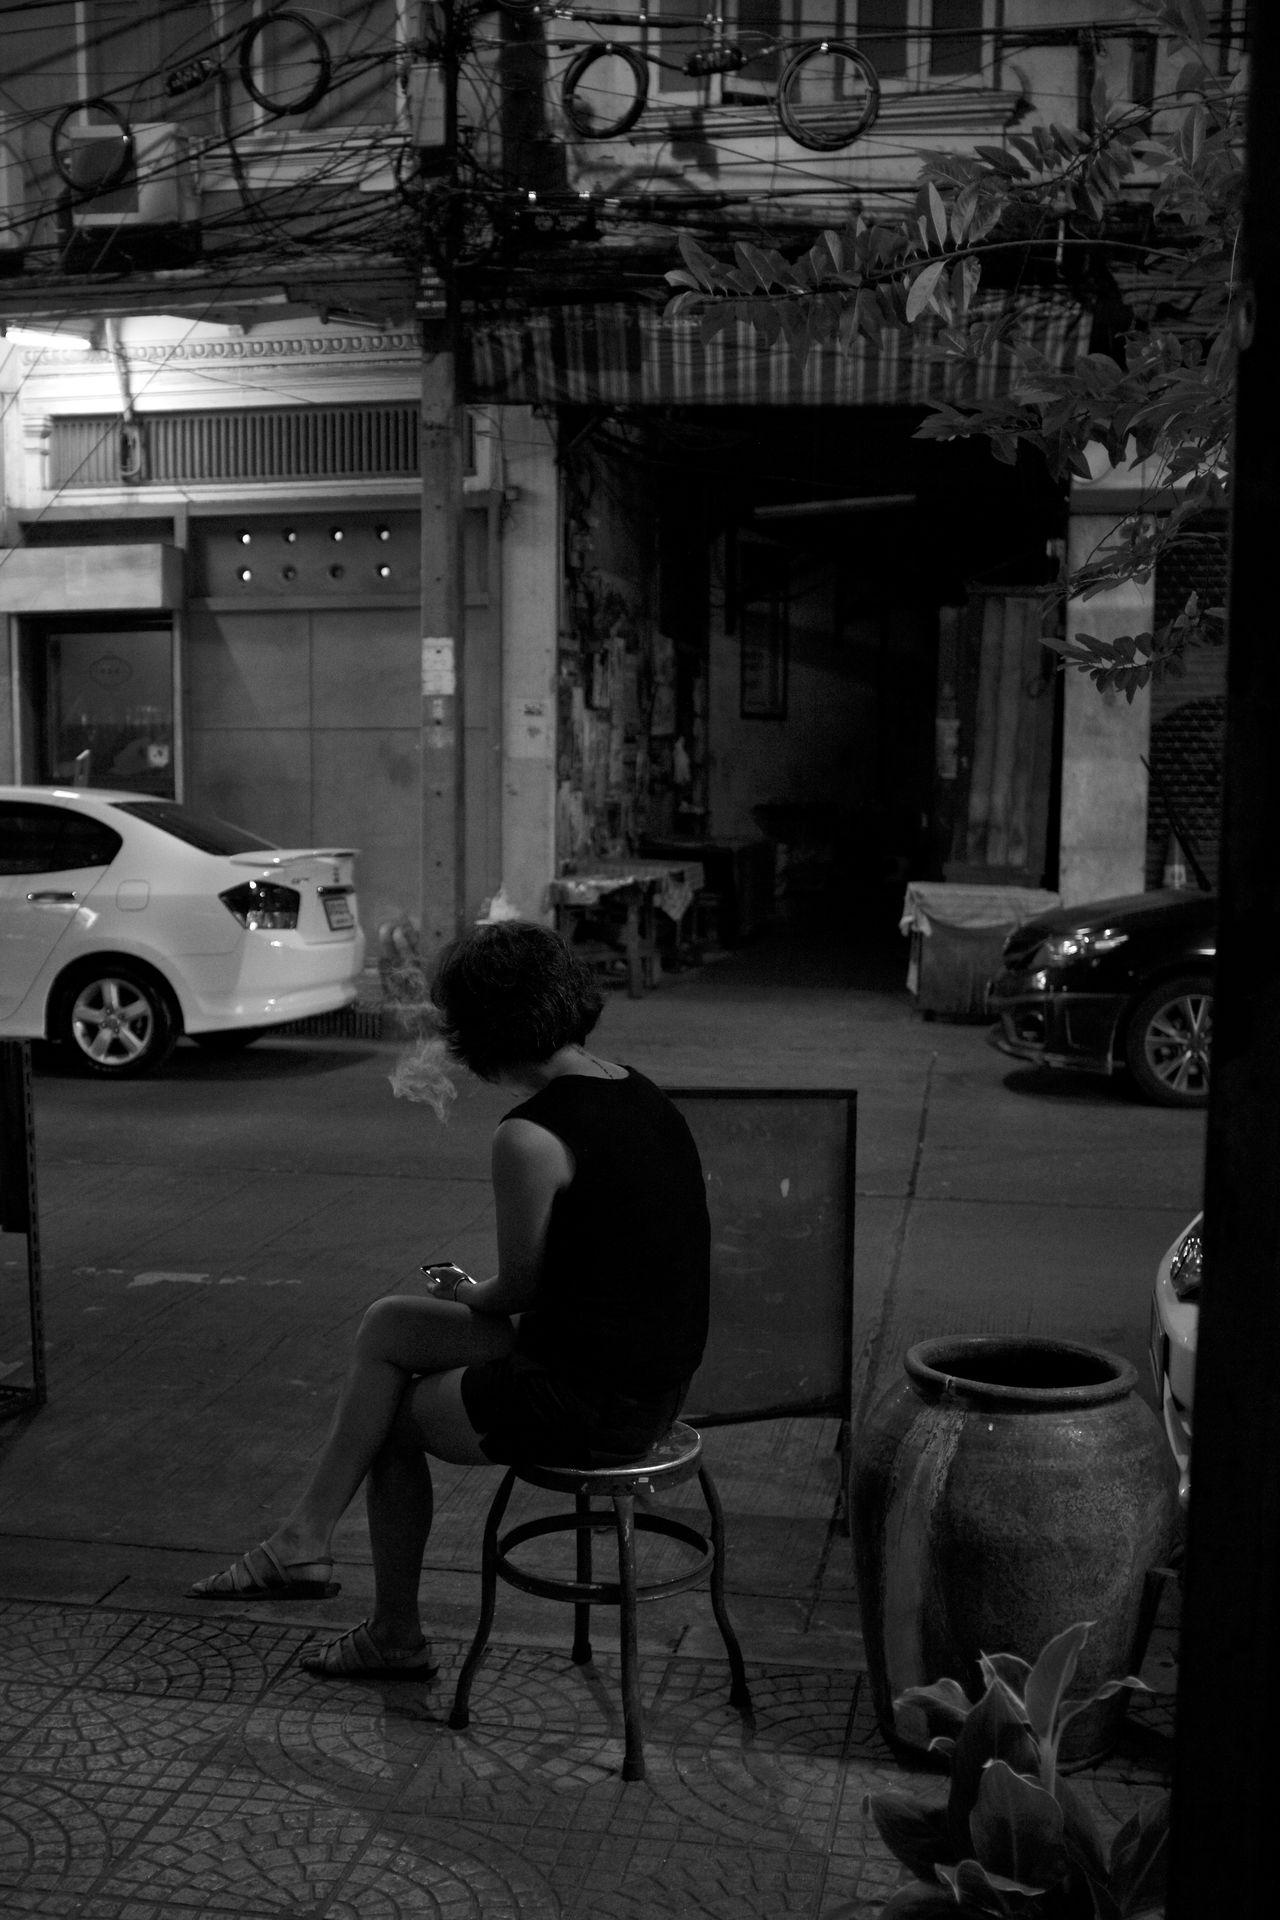 B&w Street Photography Candid City City Life Monochrome Streetphotography The Street Photographer - 2017 EyeEm Awards Urban Lifestyle